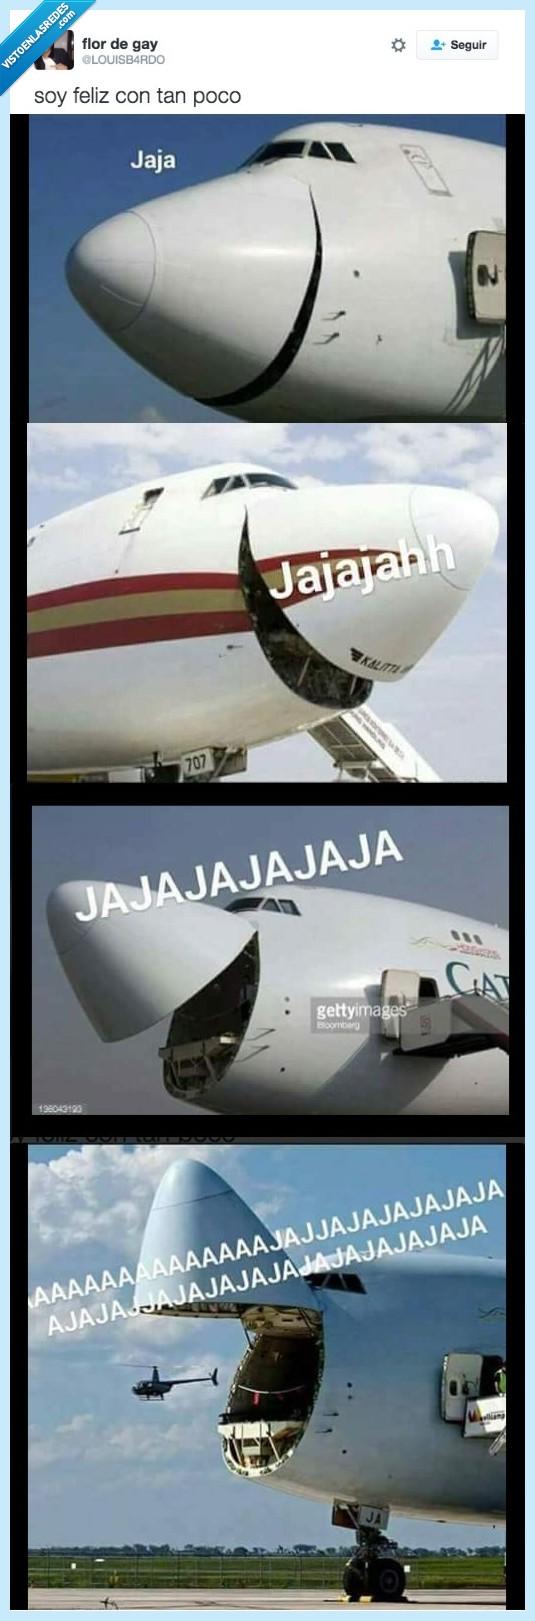 avióon,partirse,risa